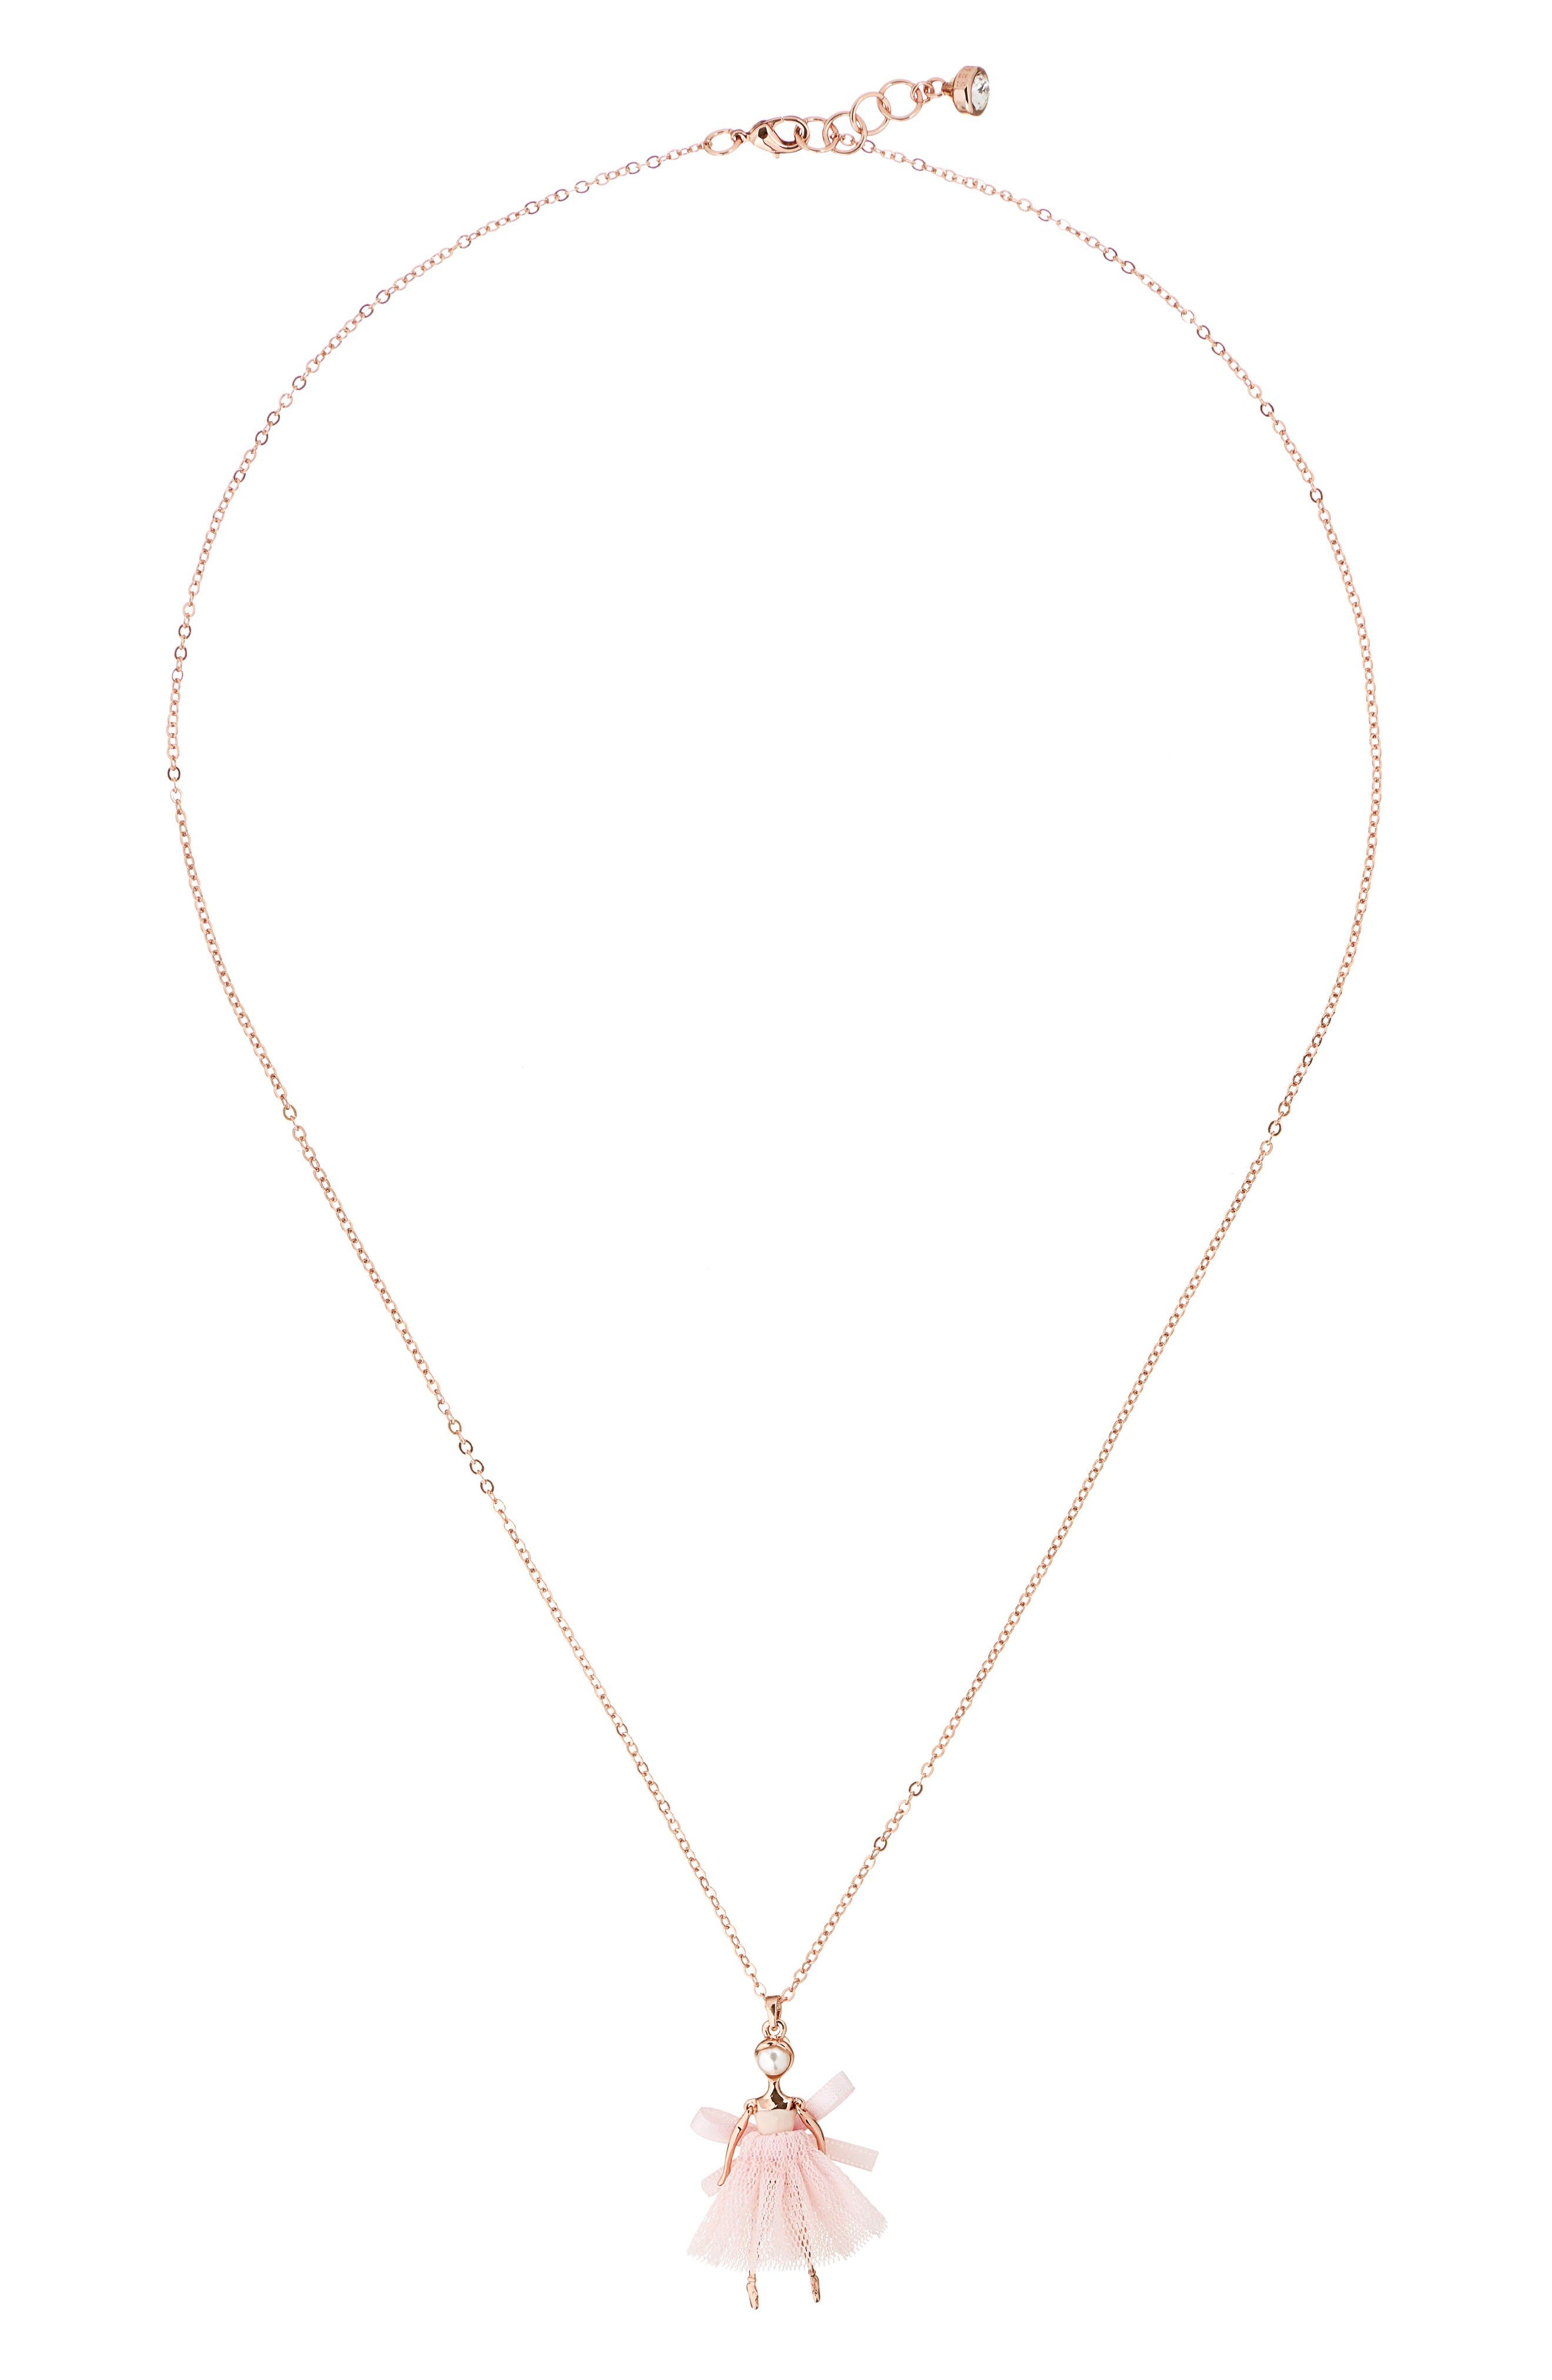 Ted Baker London Carabel Ballerina Pendant Necklace